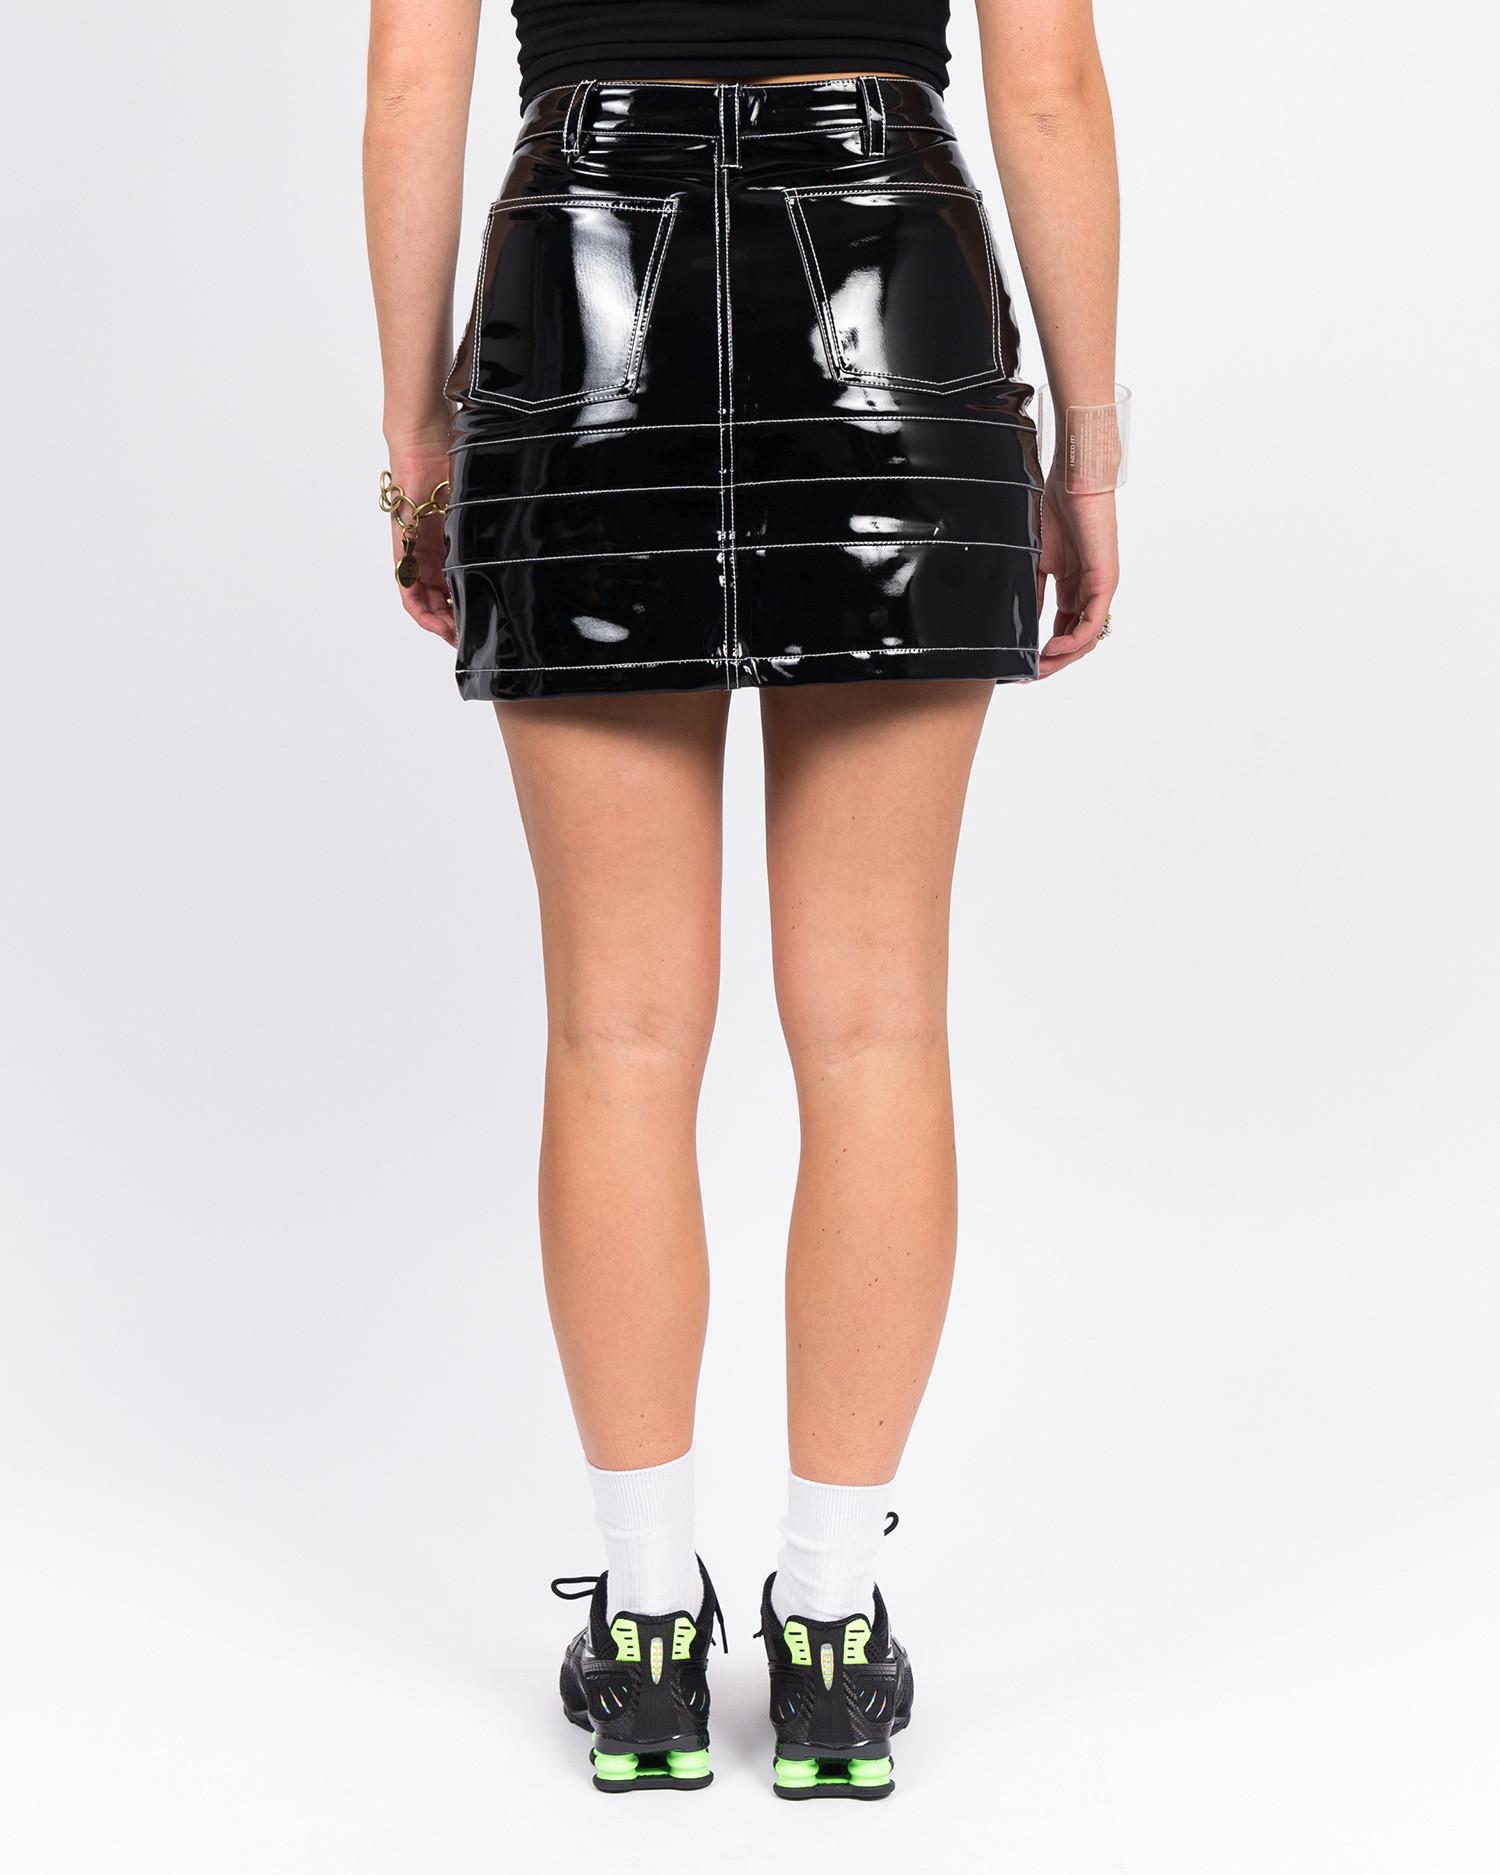 MadeMe Vinyl Skirt Black Patent